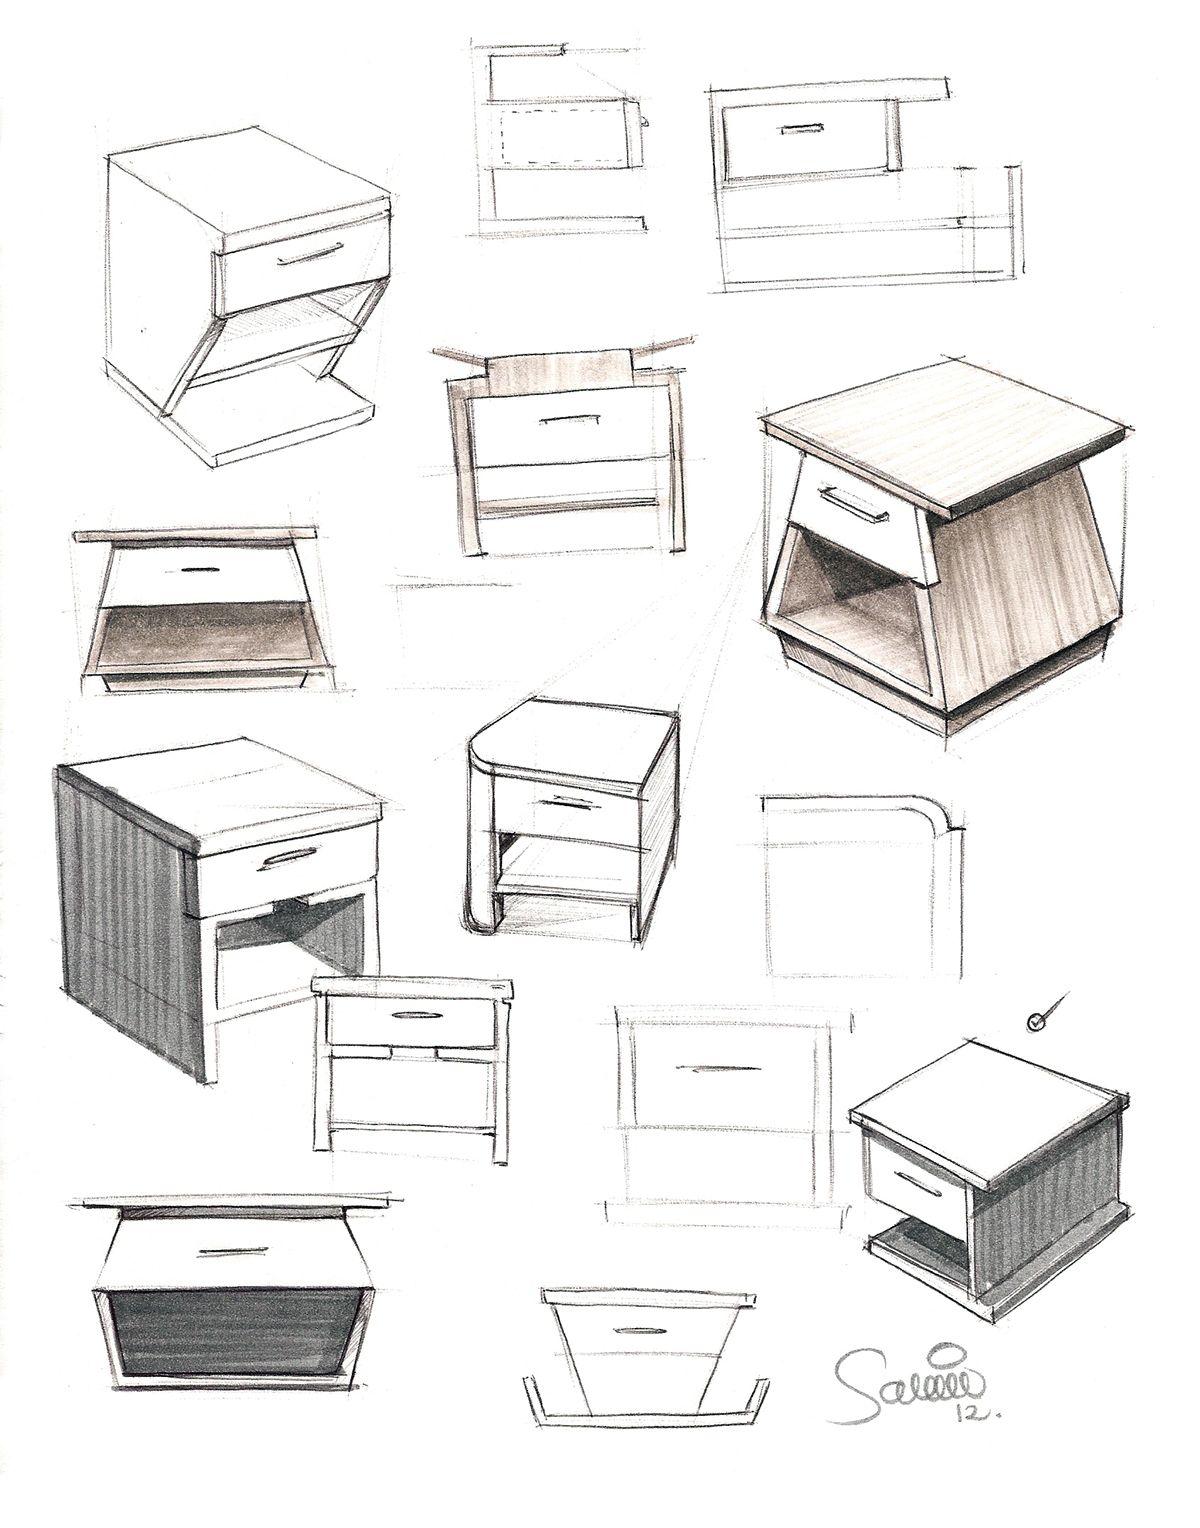 Industrial design sketches furniture - Design Furniture Sketches Inspiration Design Furniture Sketches Inspiration Is A Part Of Our Furniture Design Inspiration Series